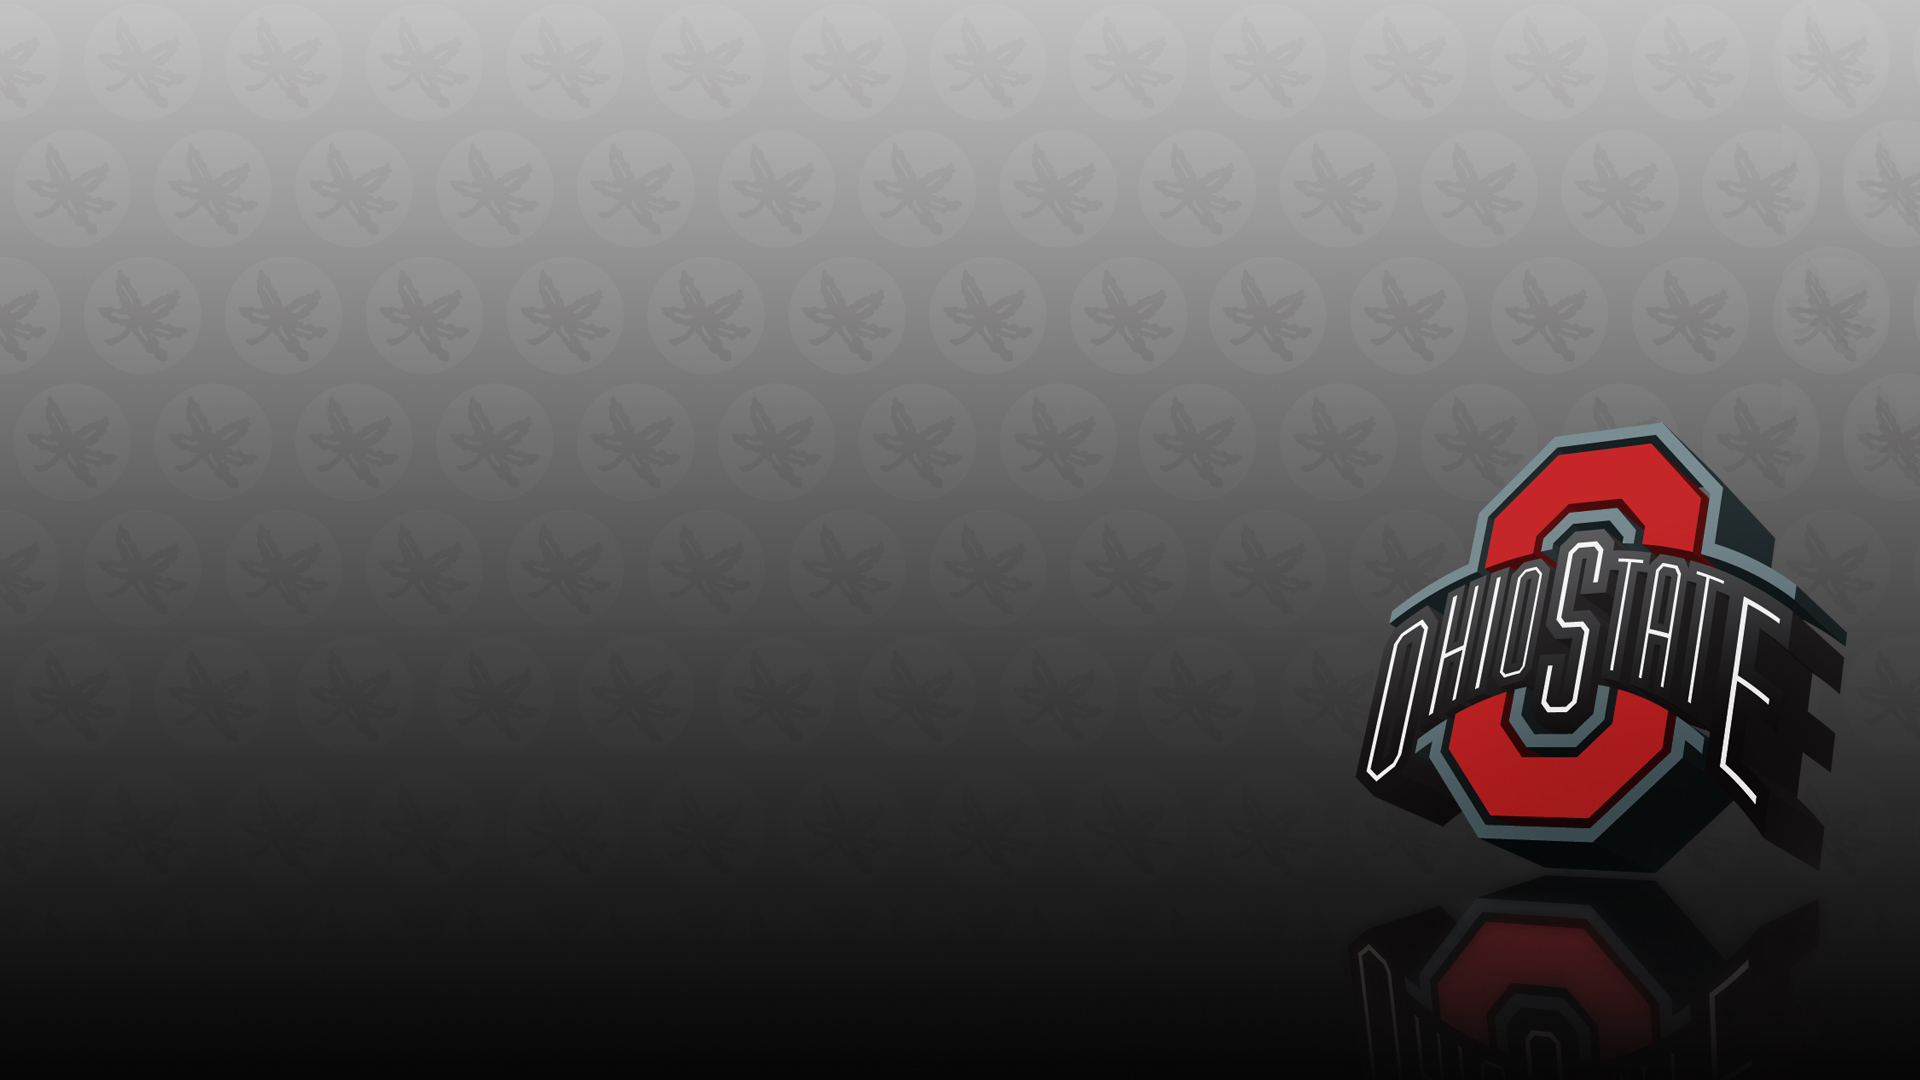 Ohio St Logo Wallpaper by Salvationalizm 1920 x 1080 1920x1080